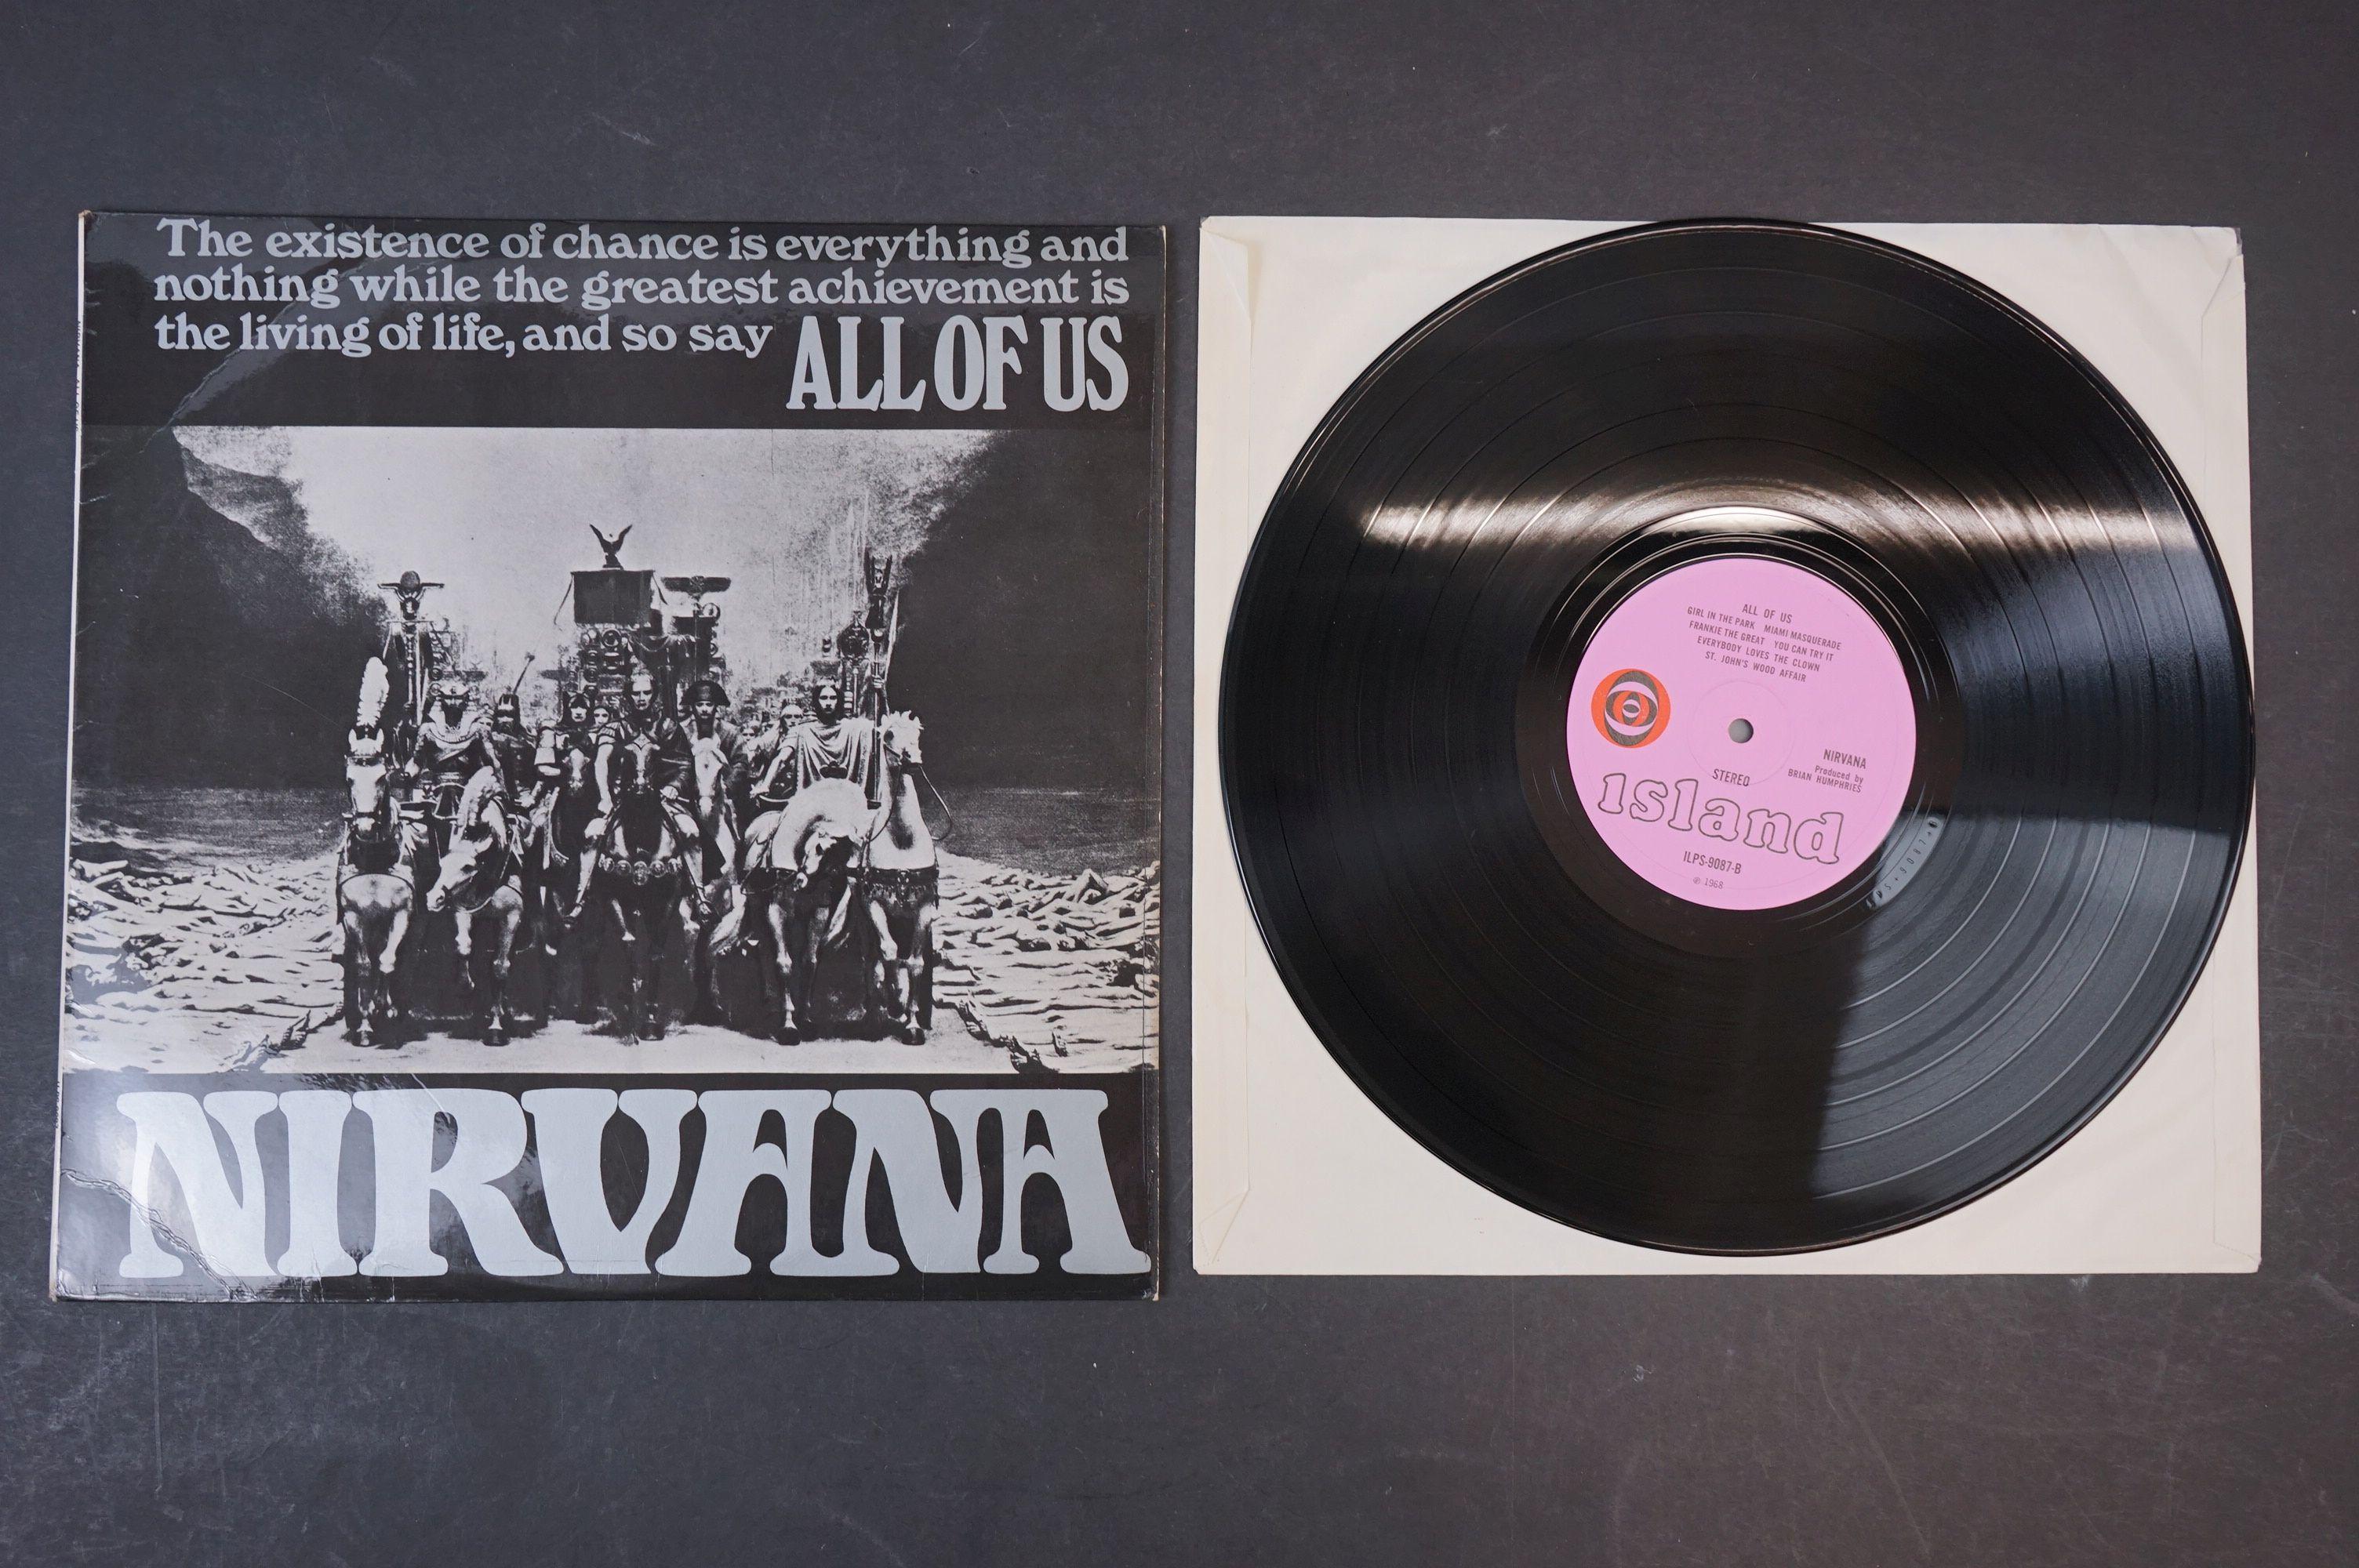 Vinyl - Nirvana All Of Us LP on Island ILPS 9087 with pink label, orange/black circle logo, - Image 2 of 6